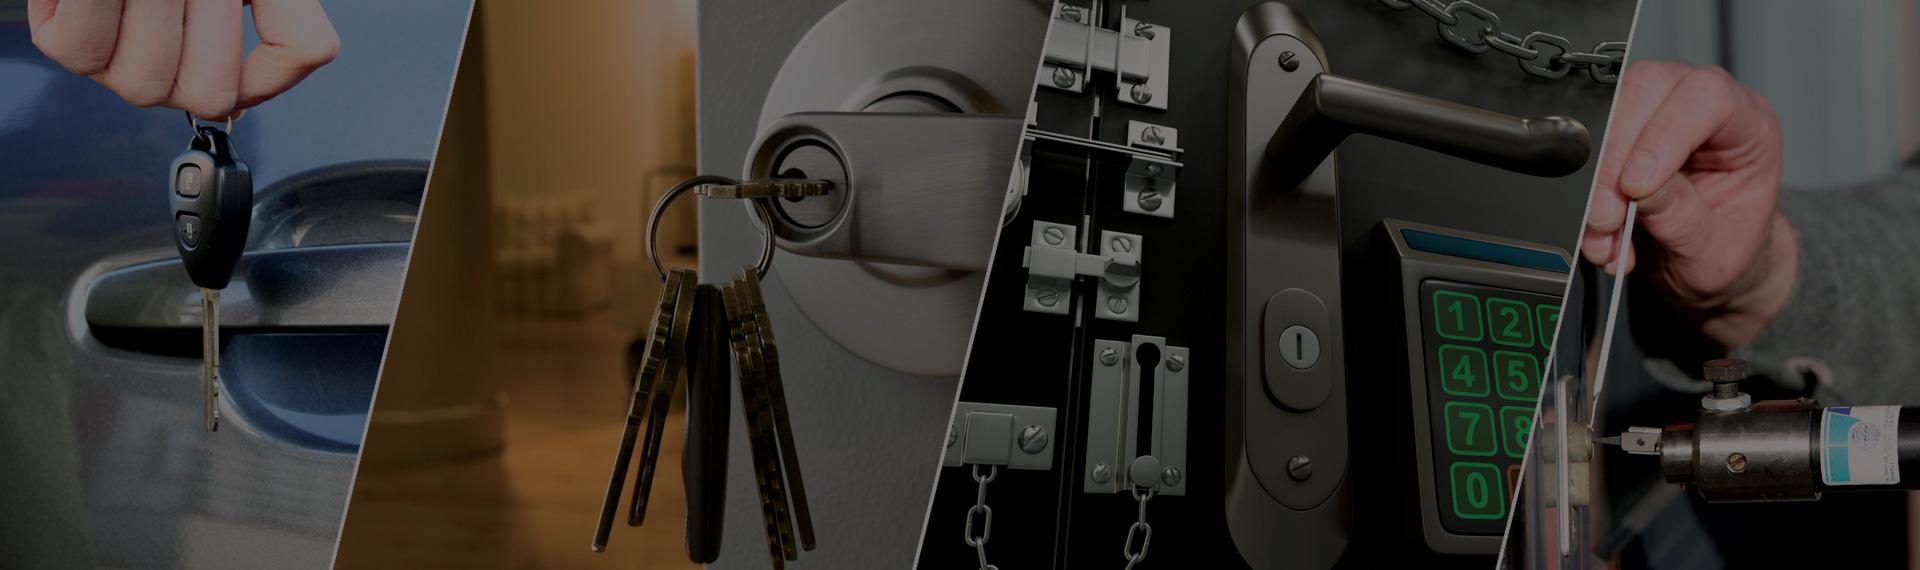 A 24 Hours Emergency Locksmith Tarrytown NY